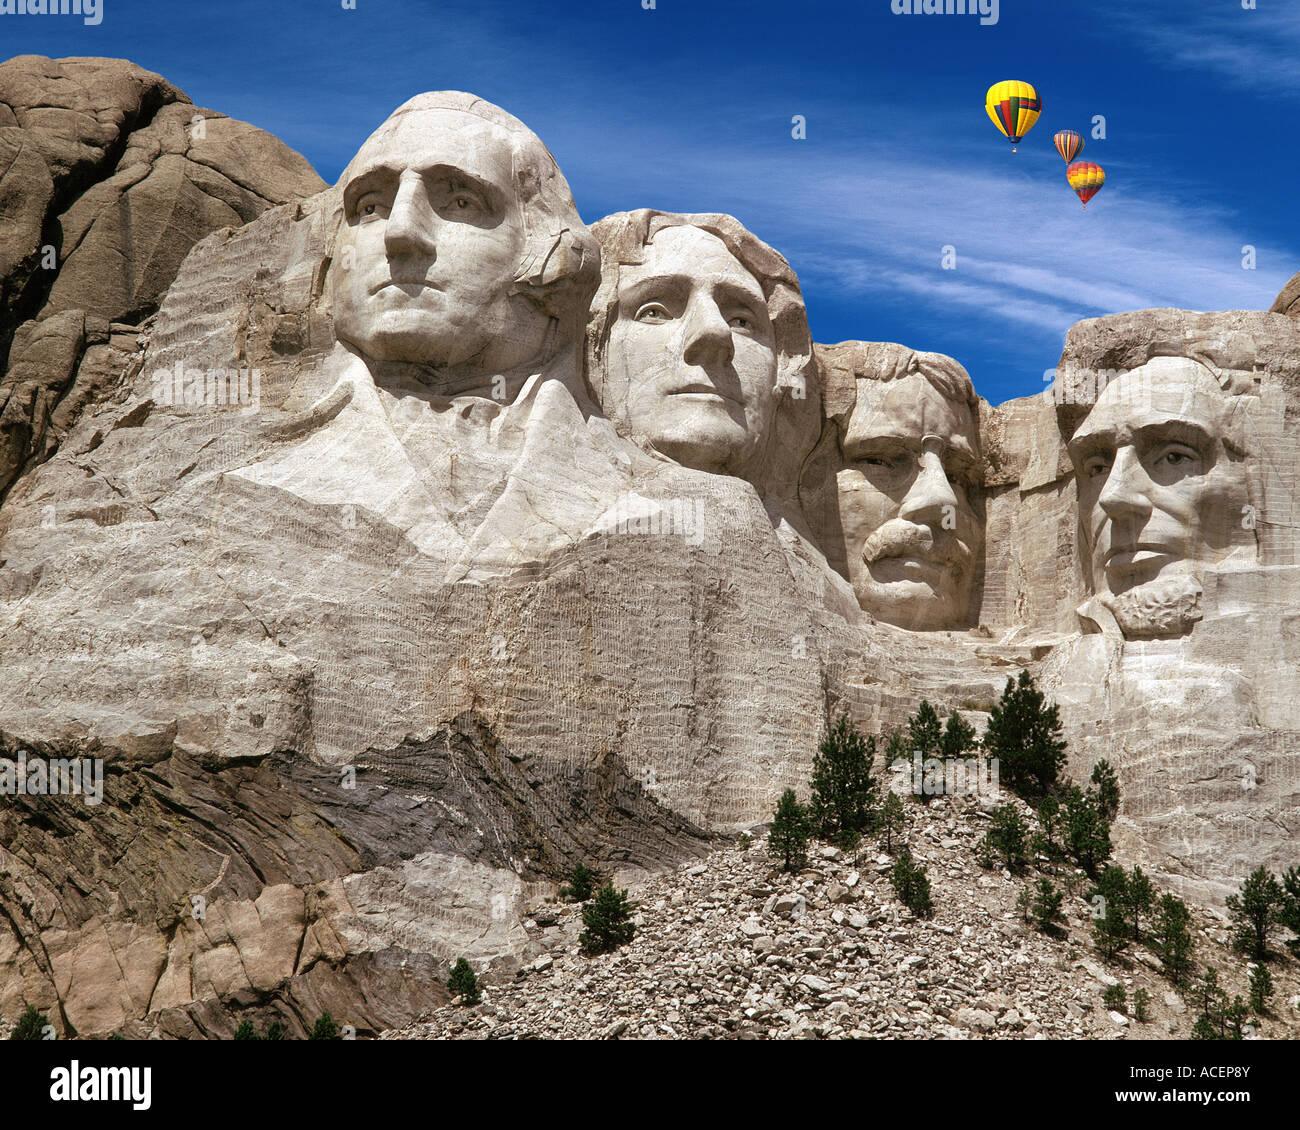 USA - SOUTH DAKOTA: Mount Rushmore National Memorial Stockbild